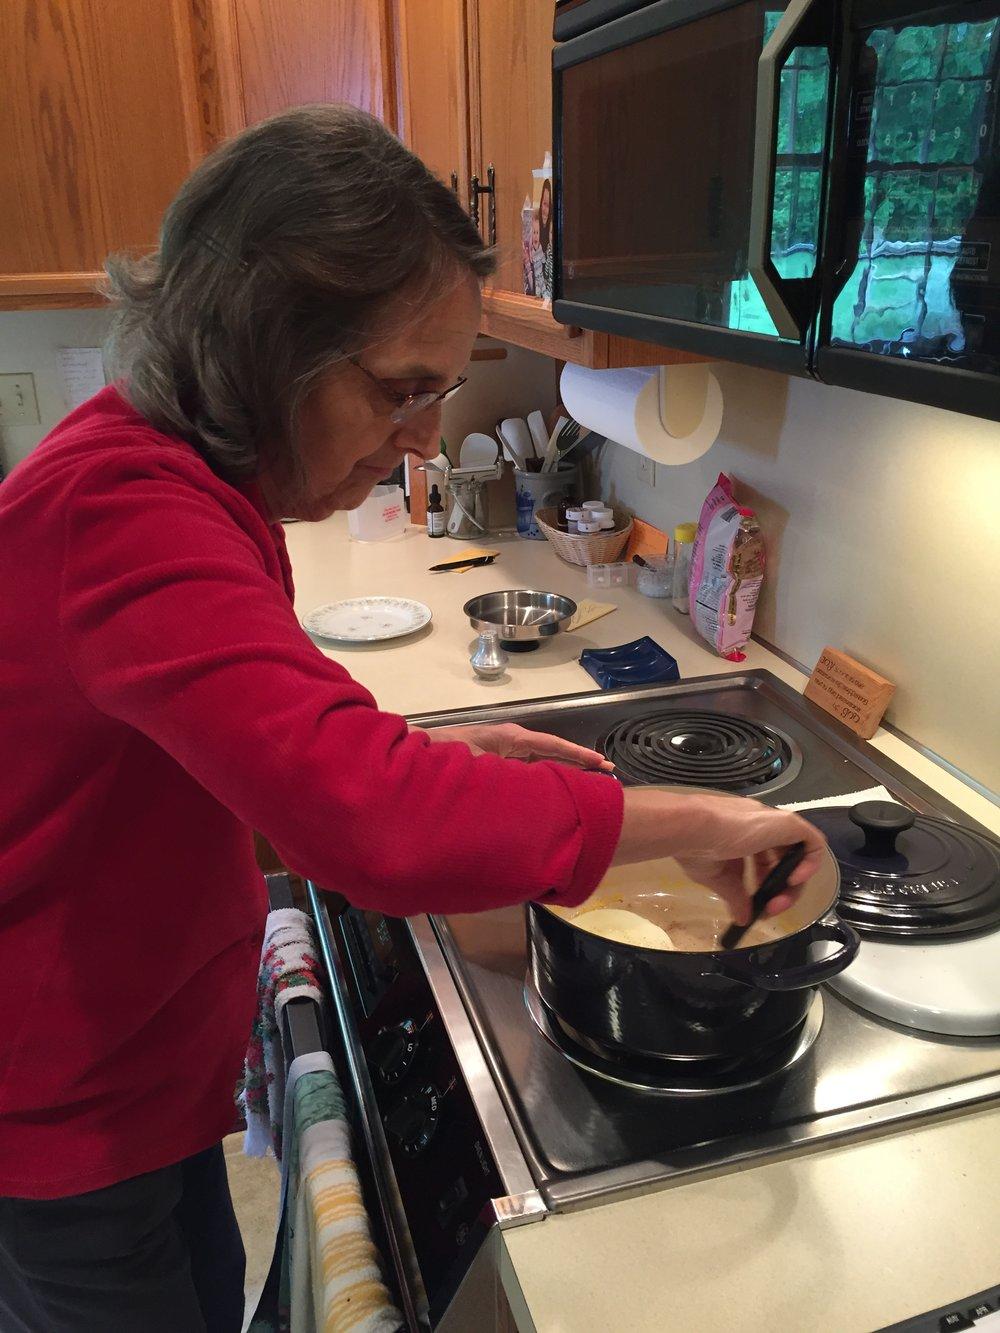 Mary making breakfast